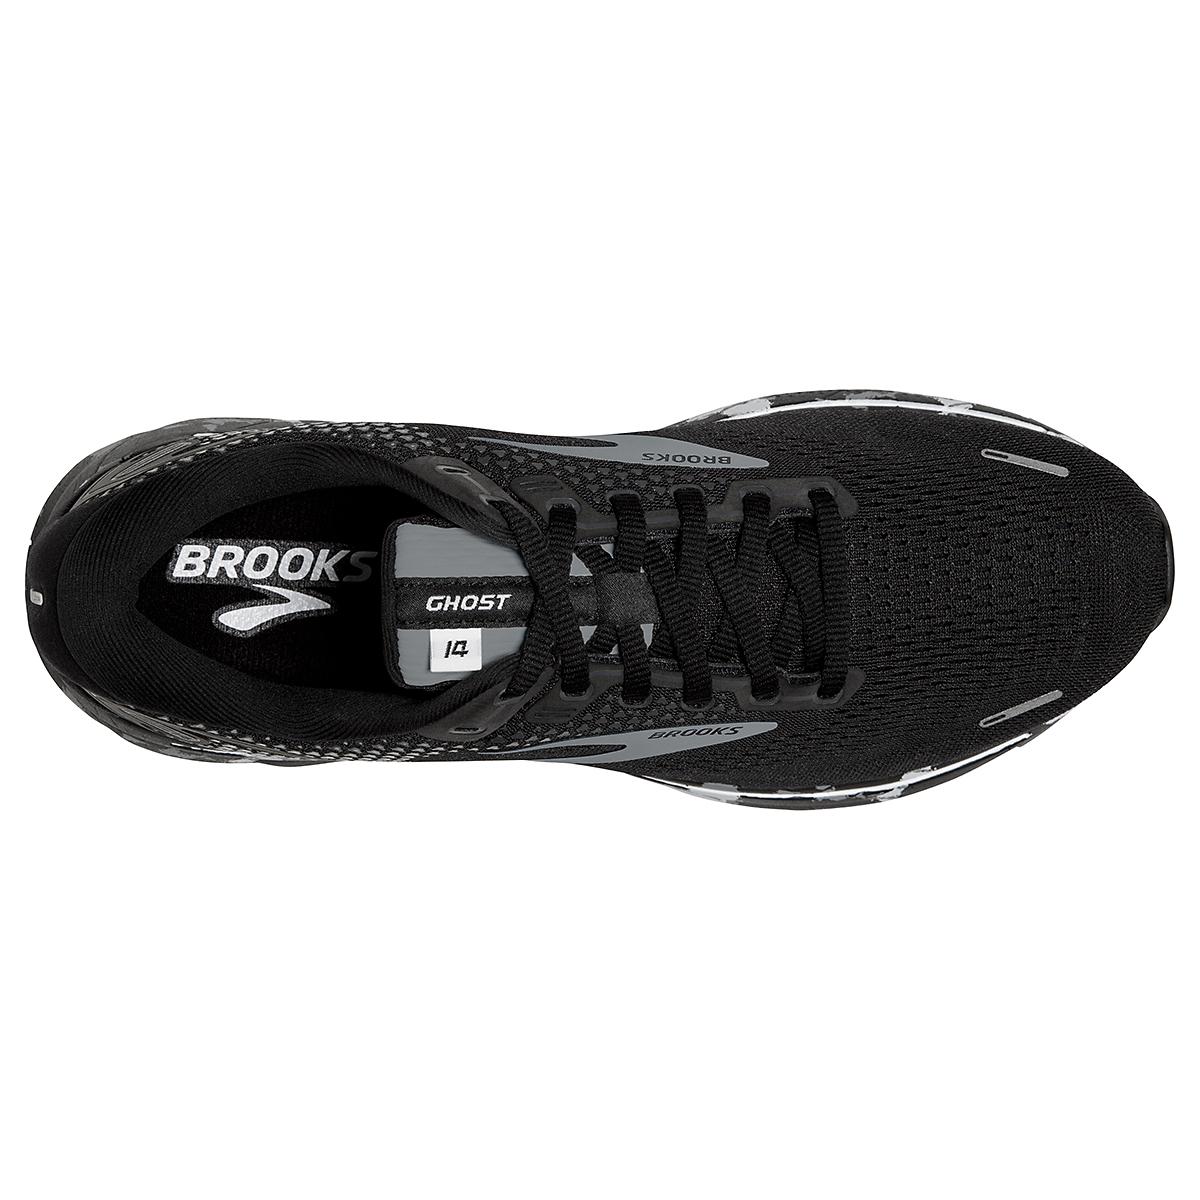 Men's Brooks Ghost 14 Running Shoe - Color: Black/Grey/White - Size: 7 - Width: Regular, Black/Grey/White, large, image 5